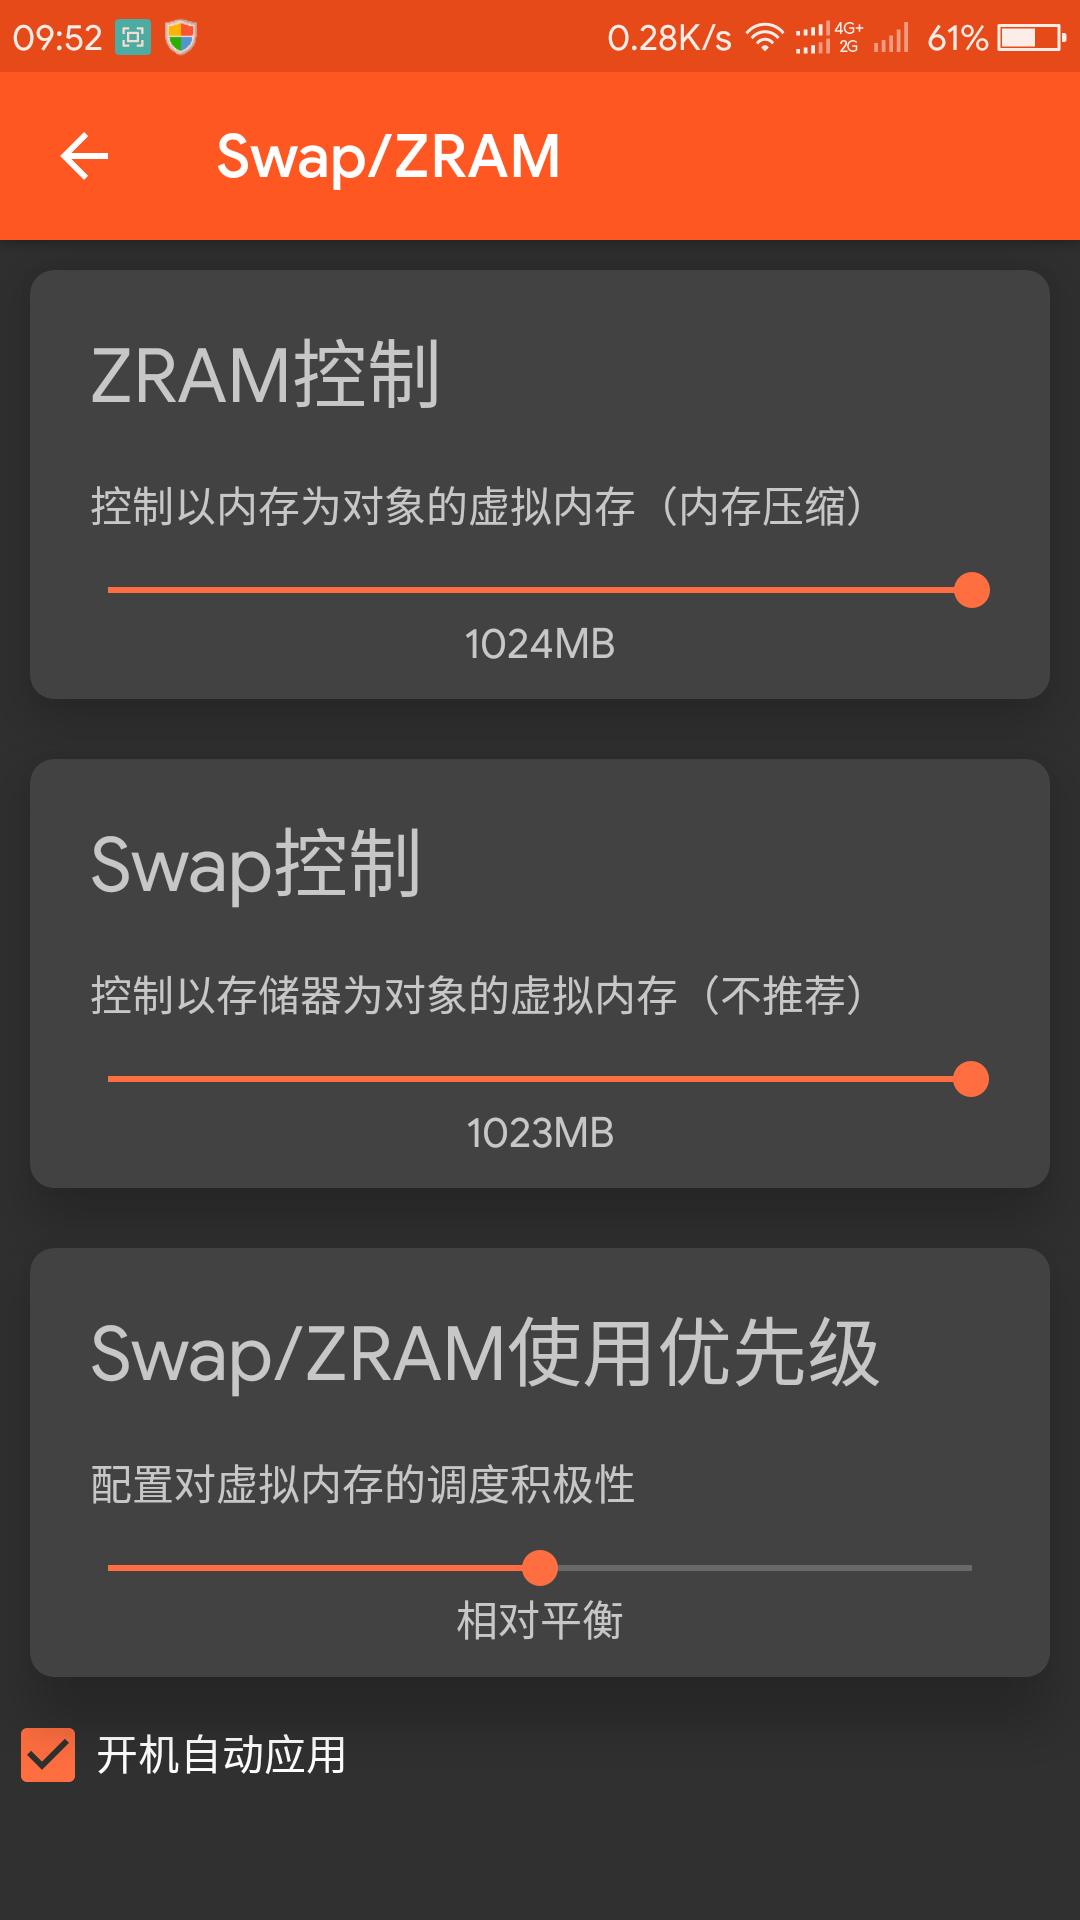 Screenshot_2020-03-28-09-52-12.png